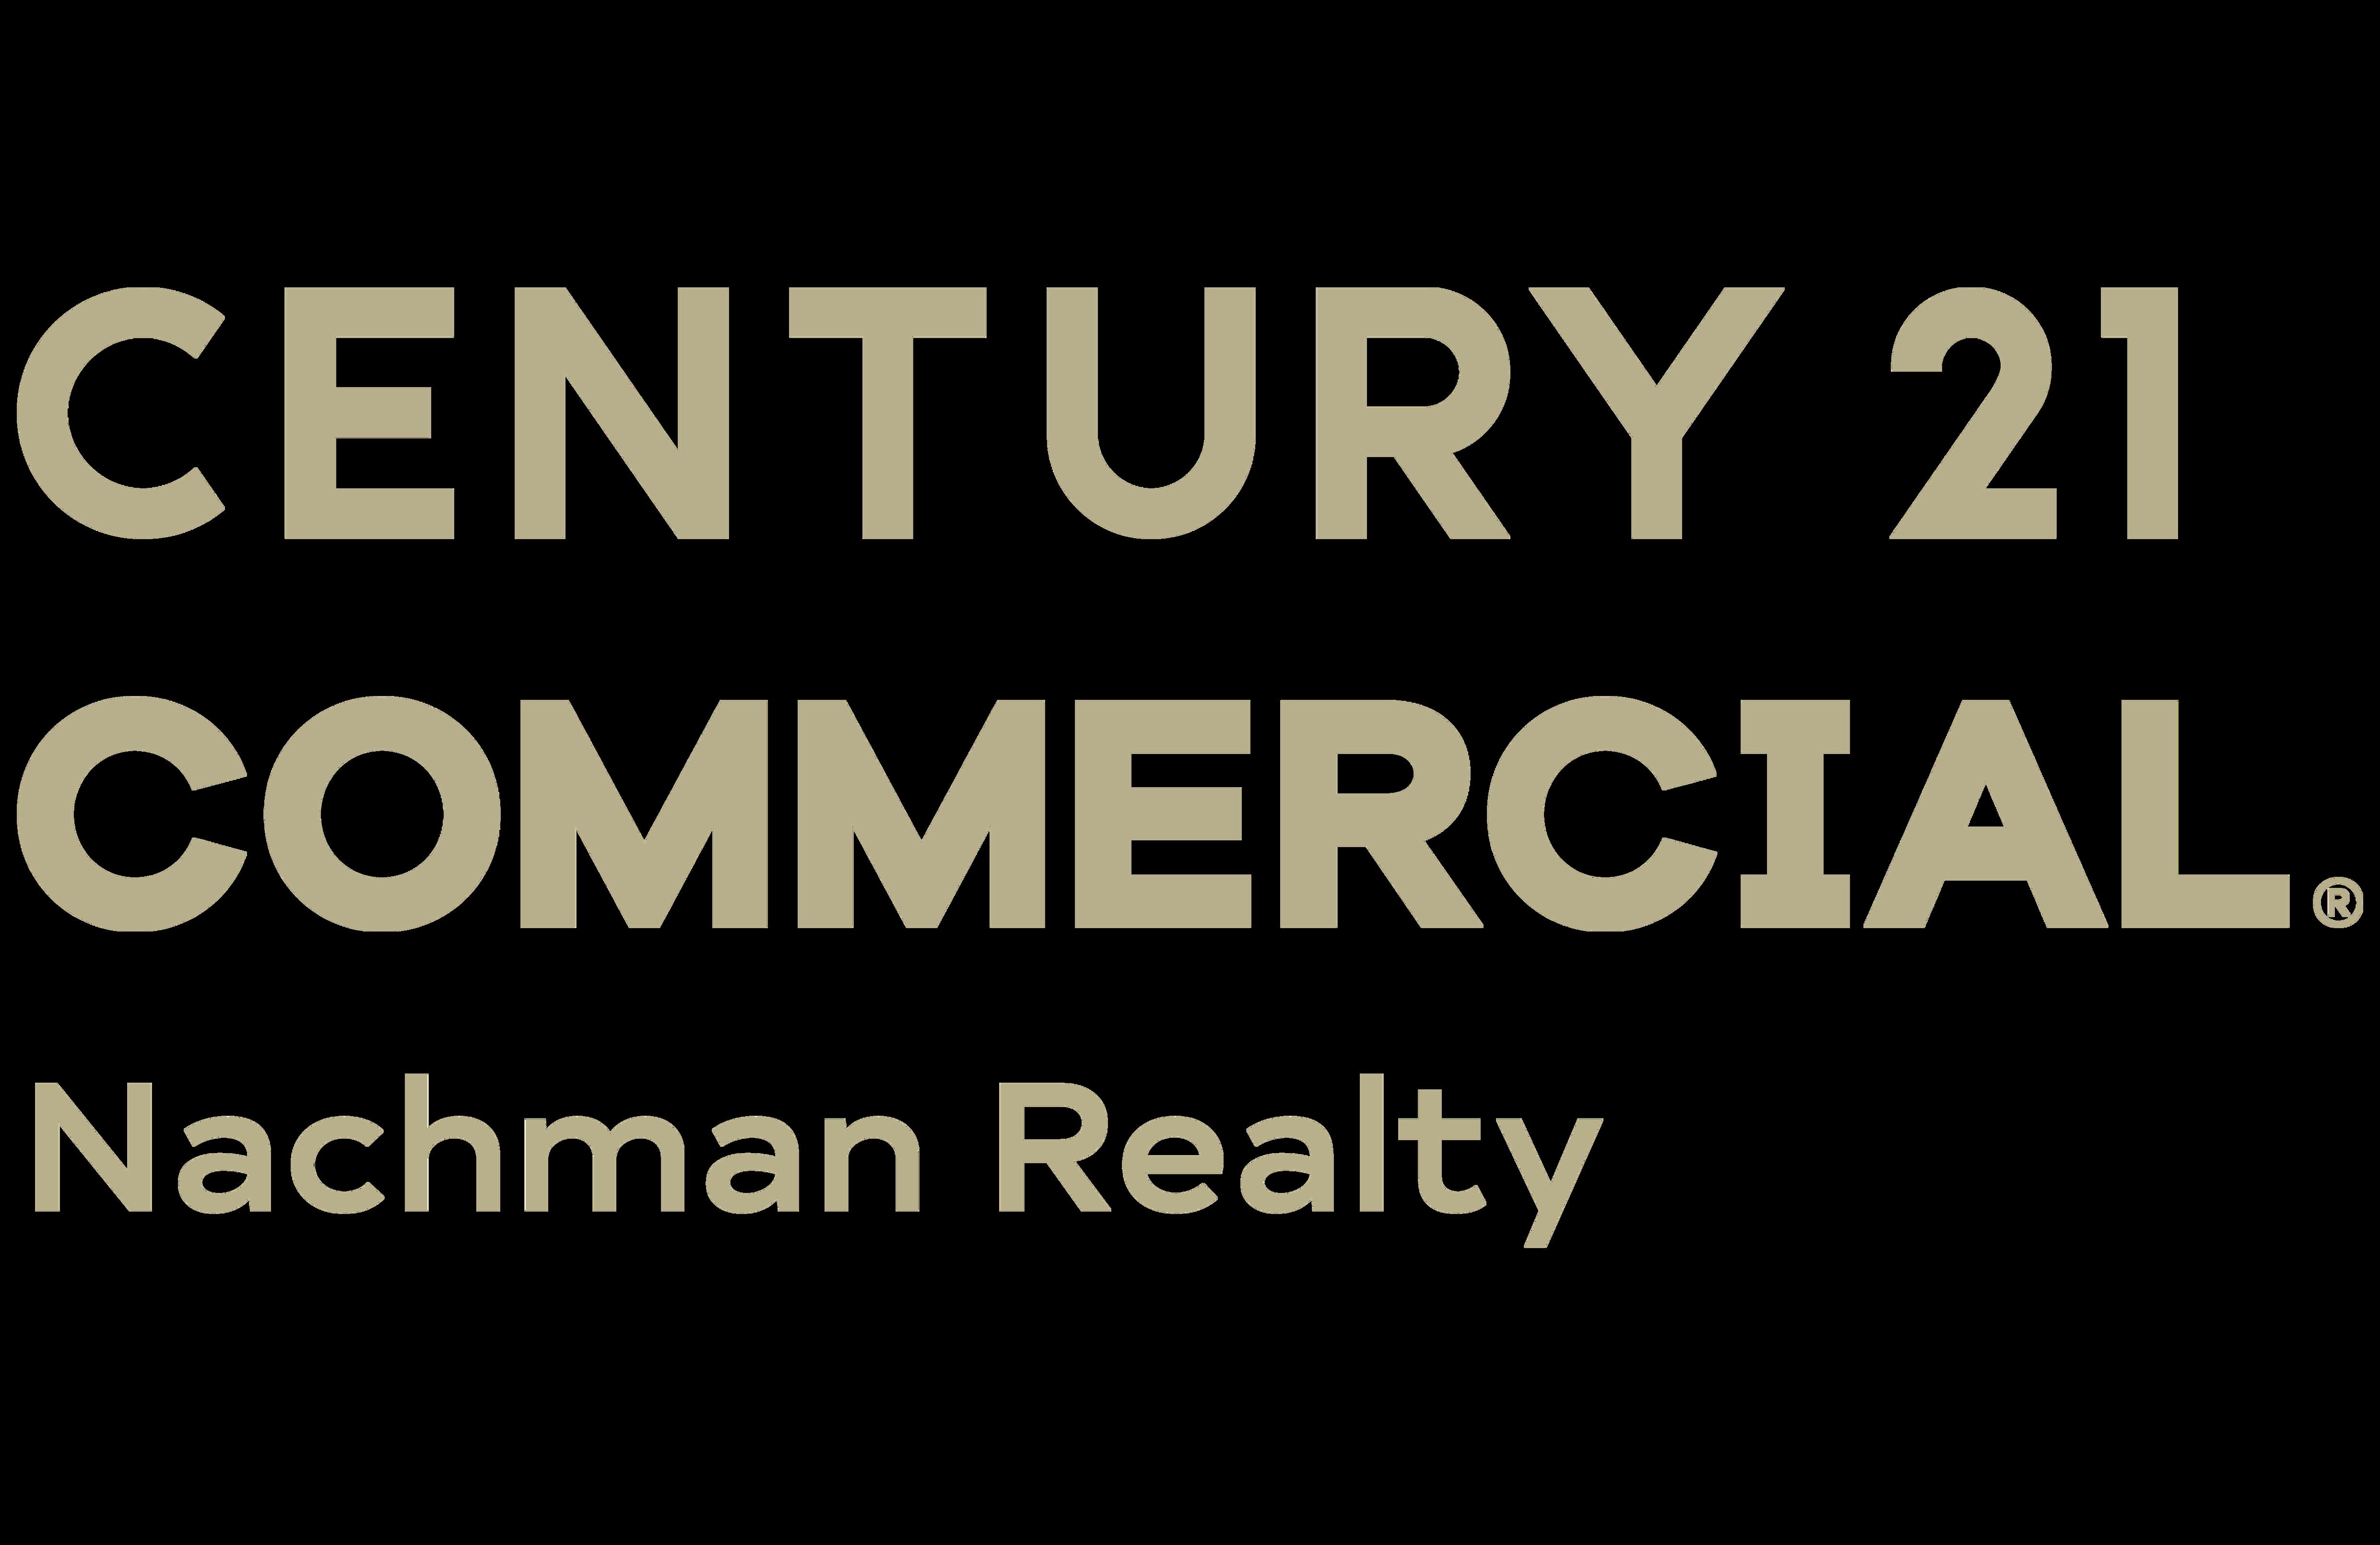 Samuel Dwyer JR of CENTURY 21 Nachman Realty logo